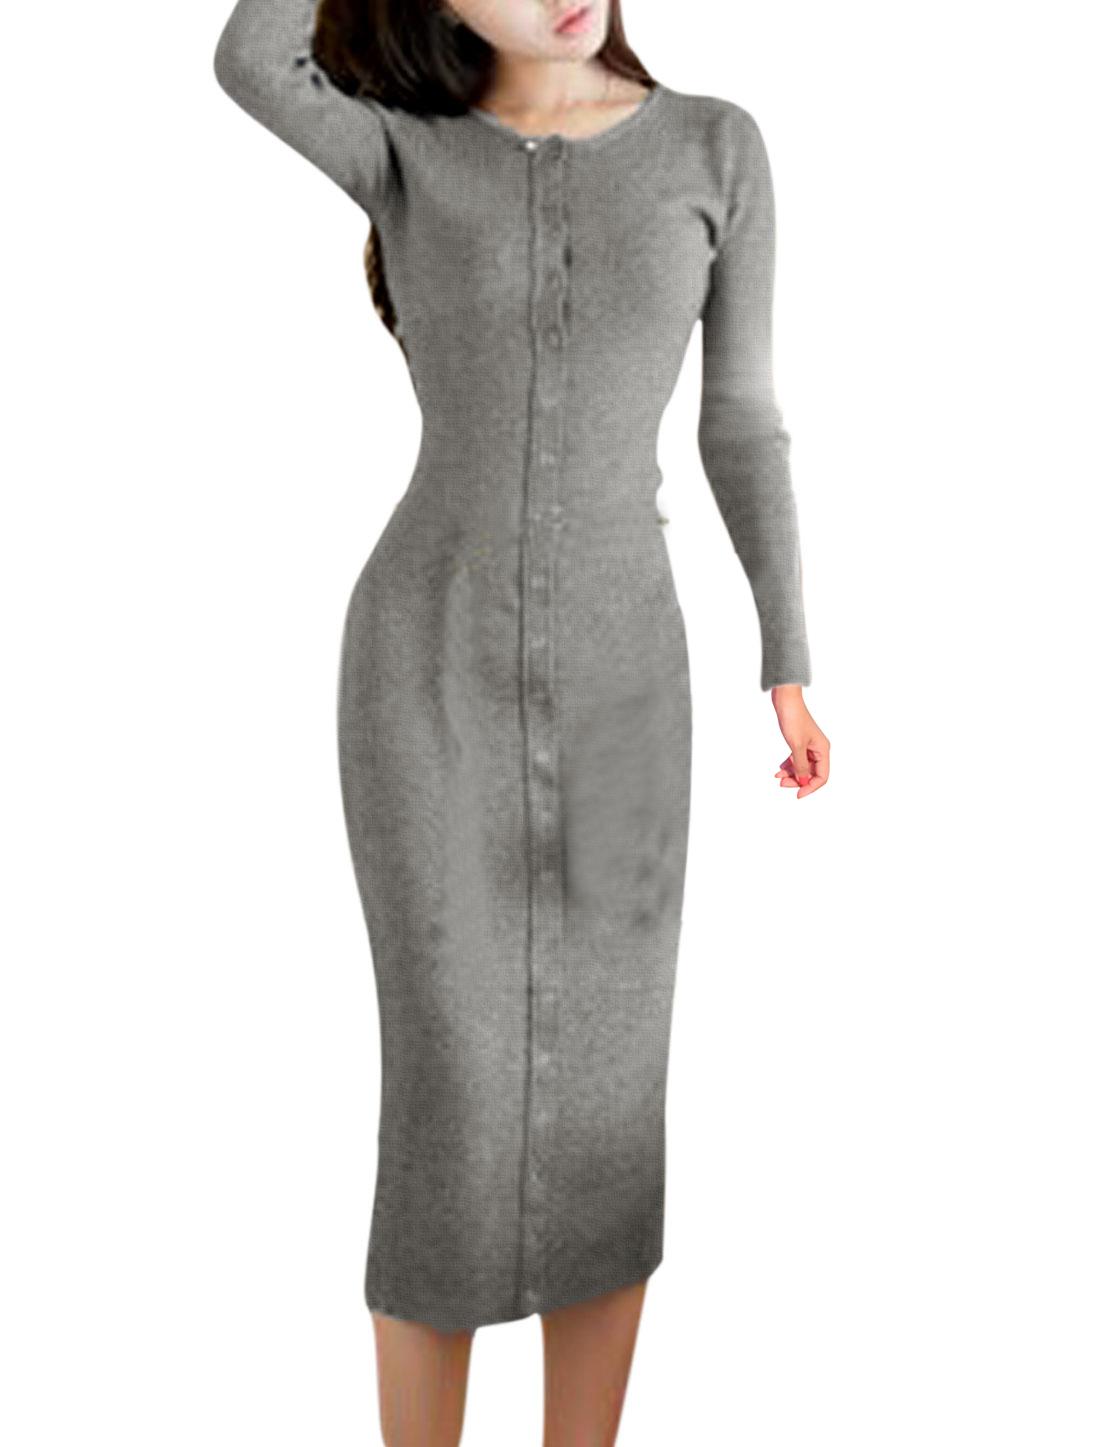 Women Metal Eyelet Decor Long Sleeve Sheath Dress Dark Gray S